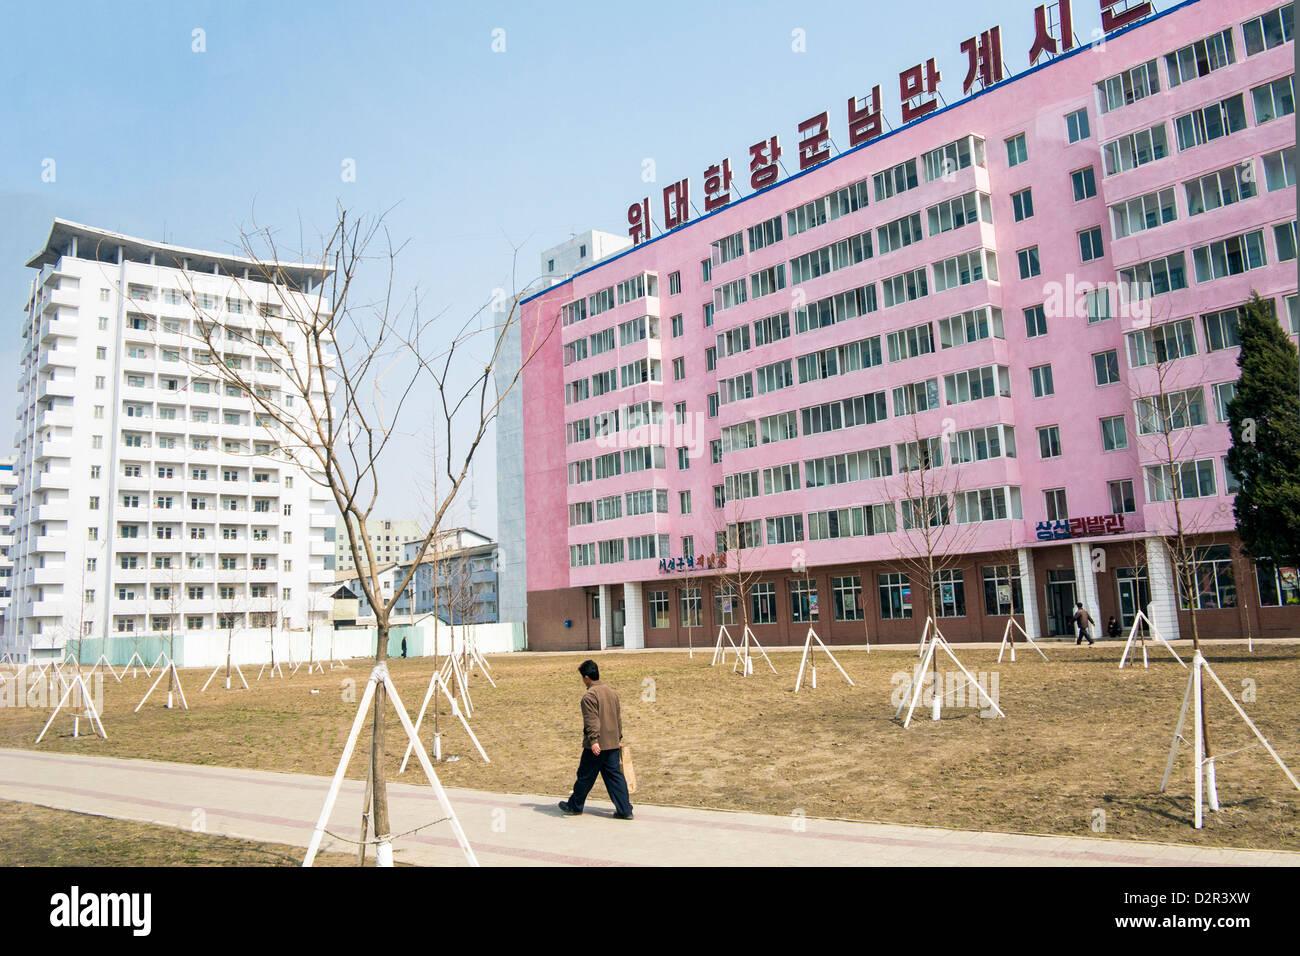 Typische städtische Straßenszene in der Hauptstadt Pjöngjang, Demokratische Volksrepublik Korea (DVRK), Stockbild